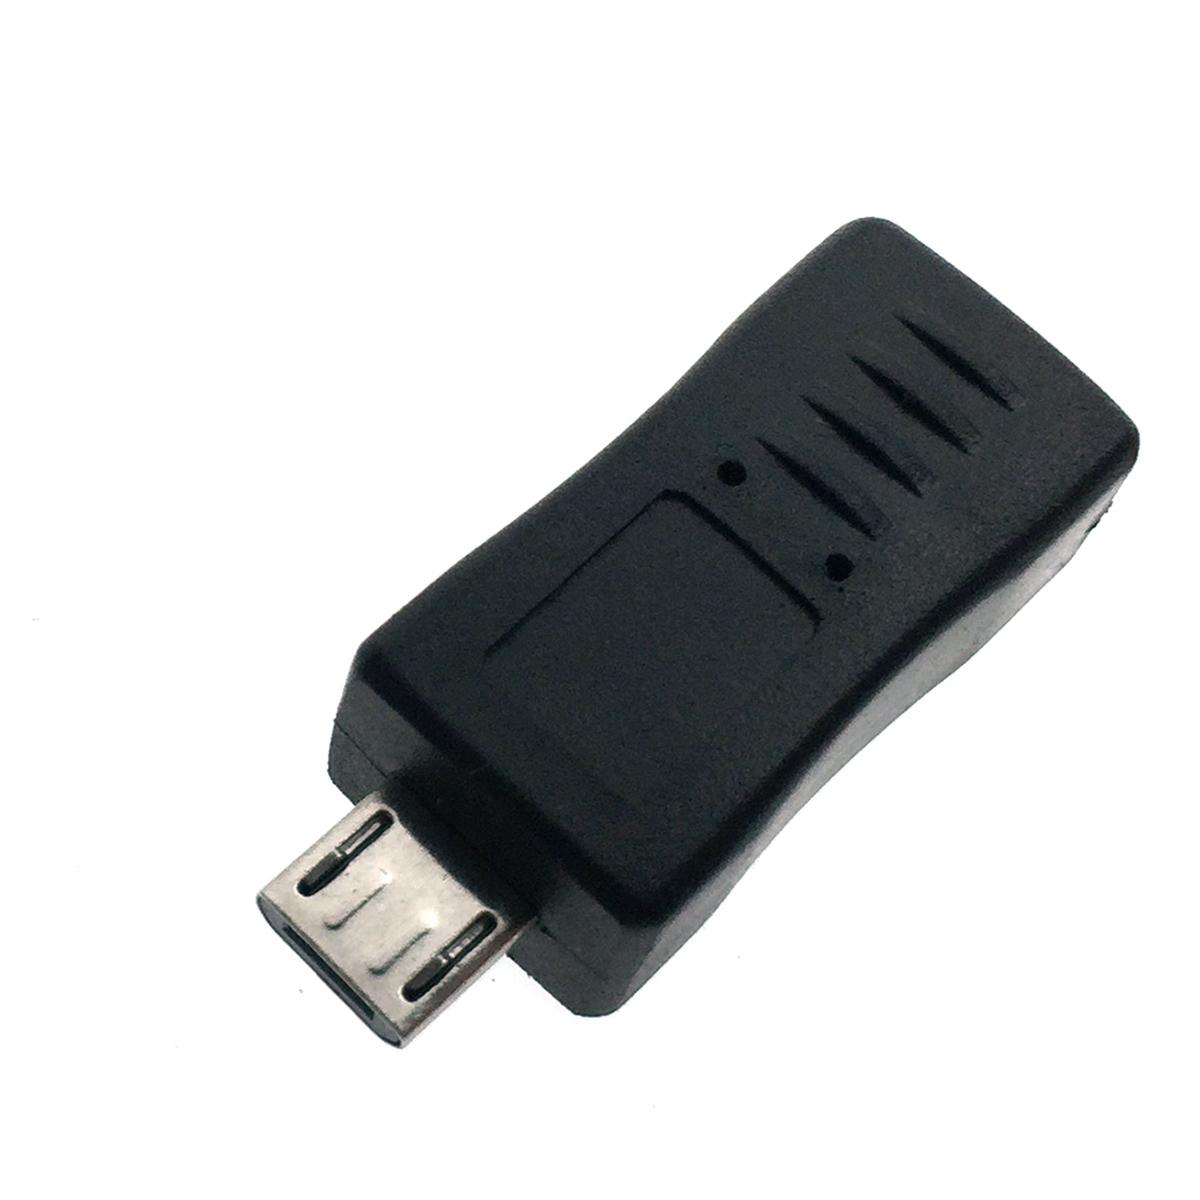 Переходник micro USB type B male to mini USB type B female Espada EUSB2mnBF-mcBM